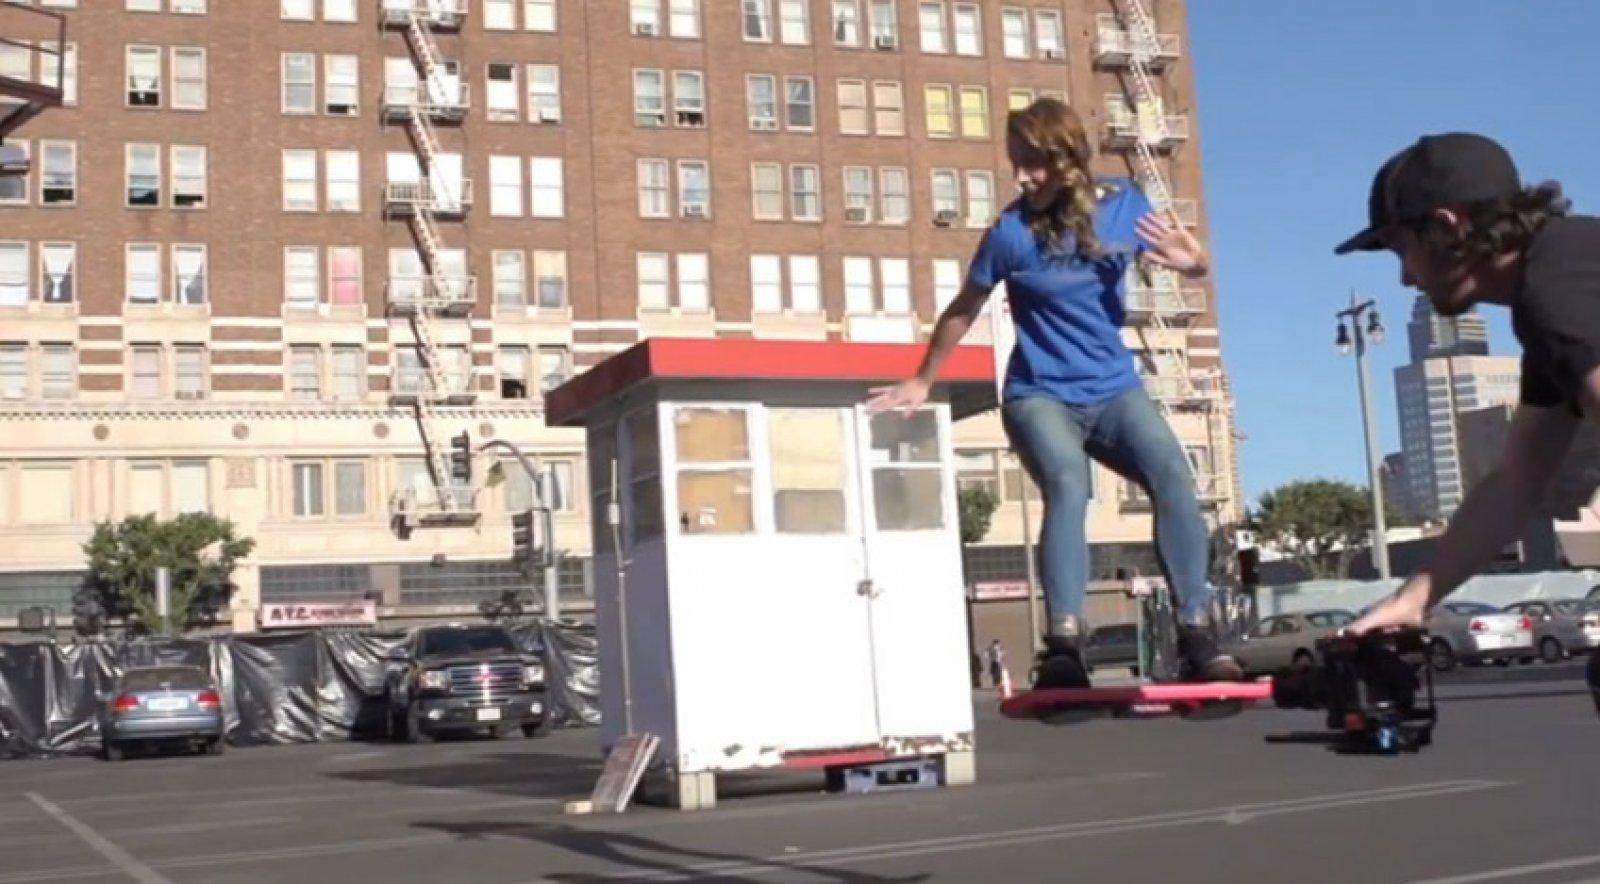 bca6361e6efca Finally: Tony Hawk unveils the Back To The Future Hoverboard ...